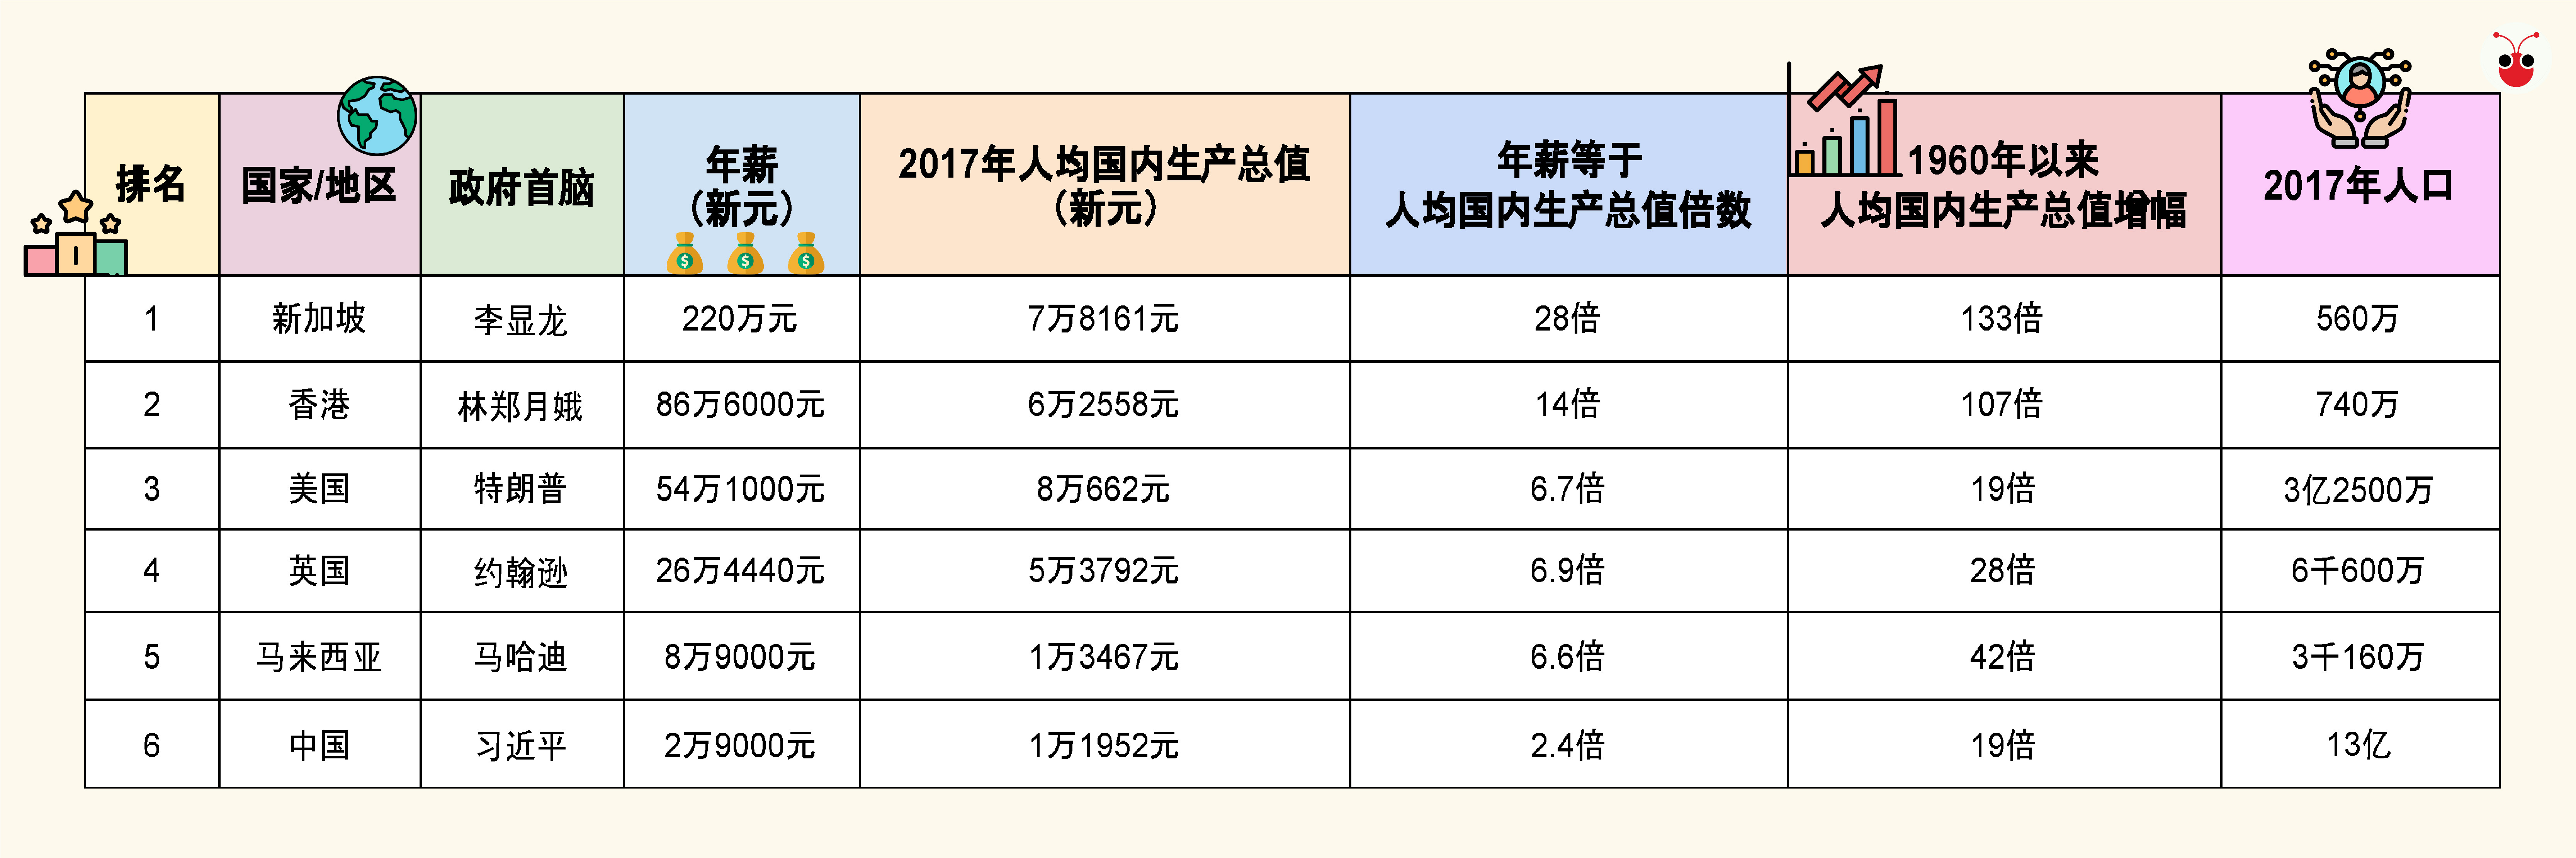 2019-08-21 table.jpg